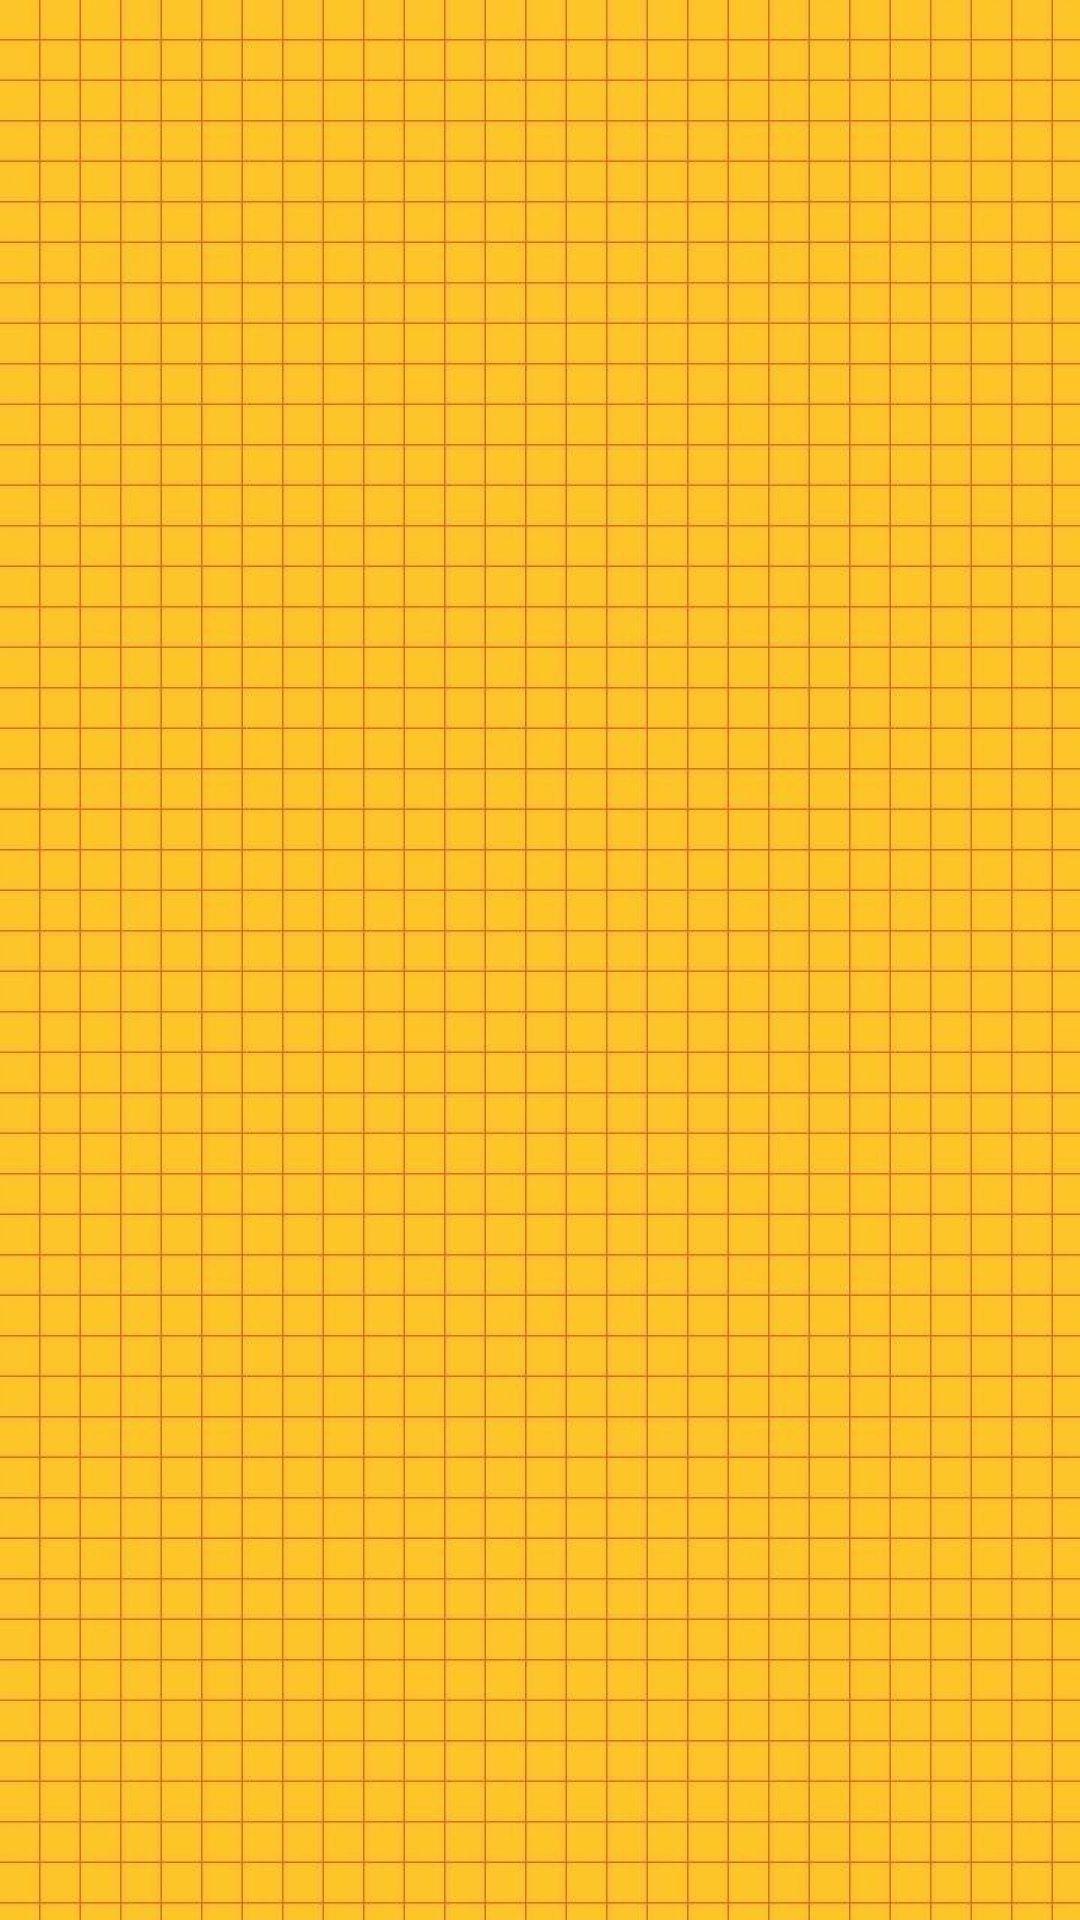 Cool Aesthetic Tumblr Artsy Yellow Aesthetic Wallpaper Pictures In 2020 Yellow Aesthetic Aesthetic Wallpapers Wallpaper Pictures